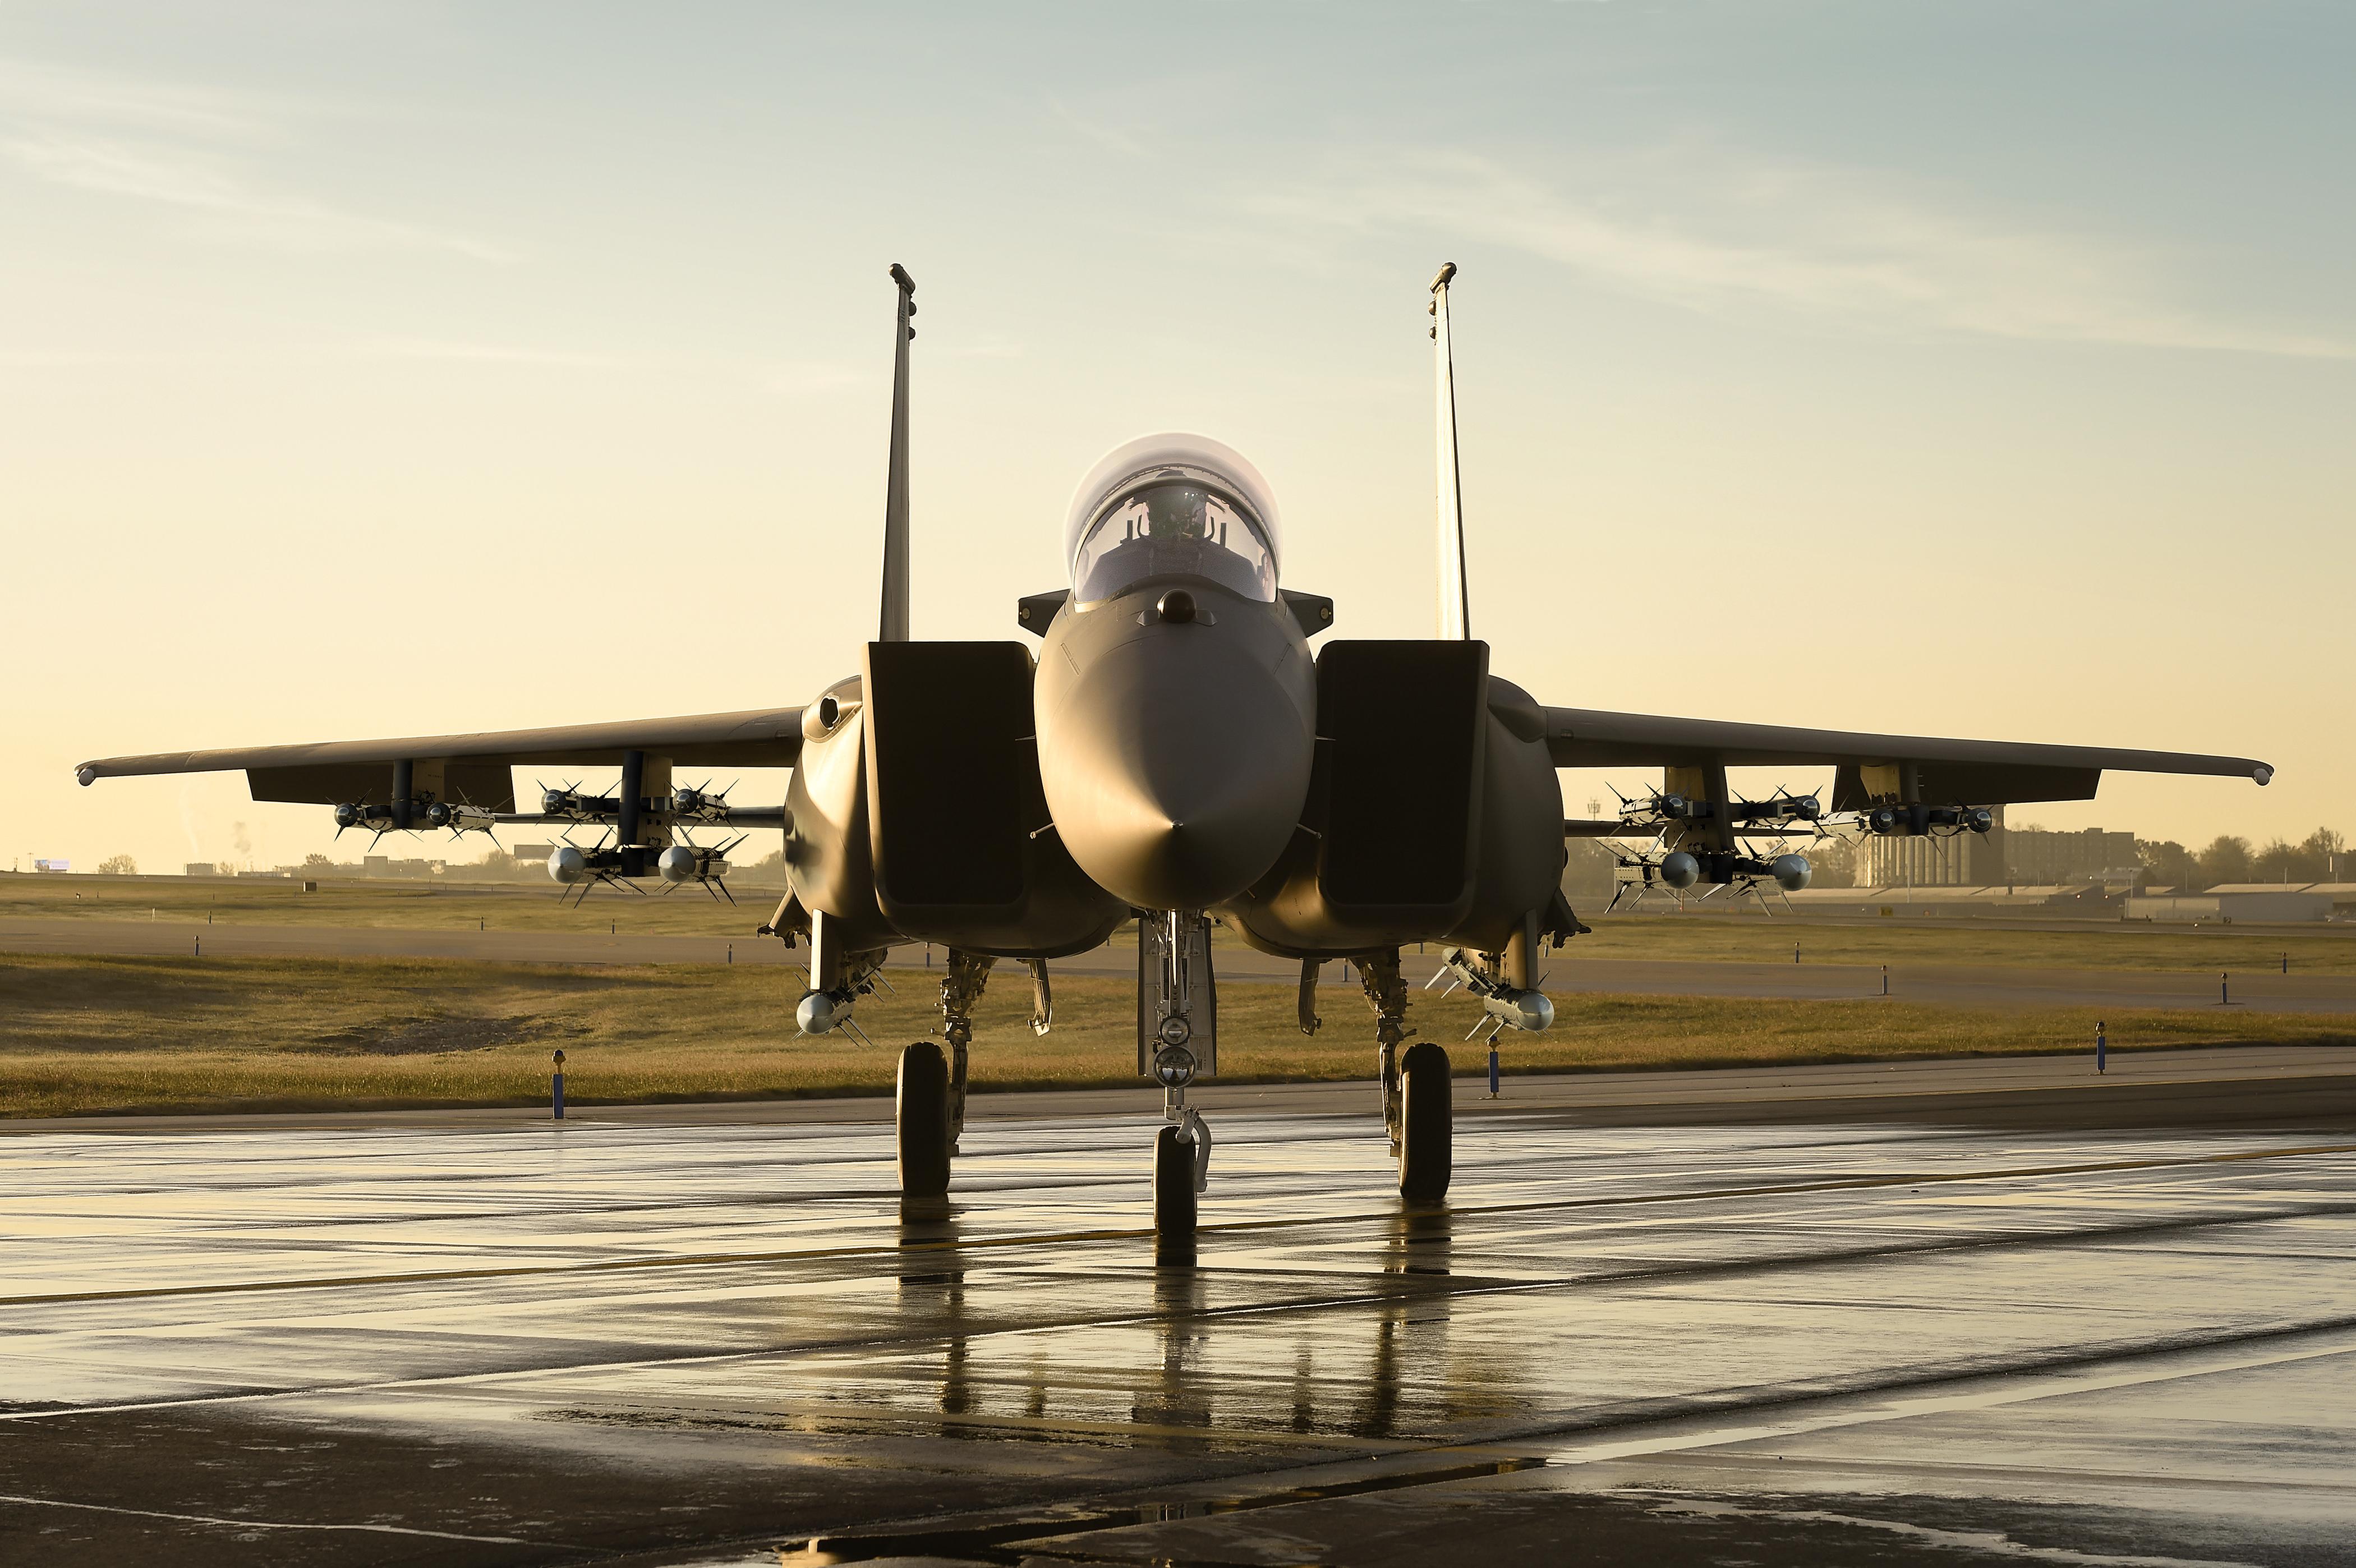 Boeing F-15 on the ground.